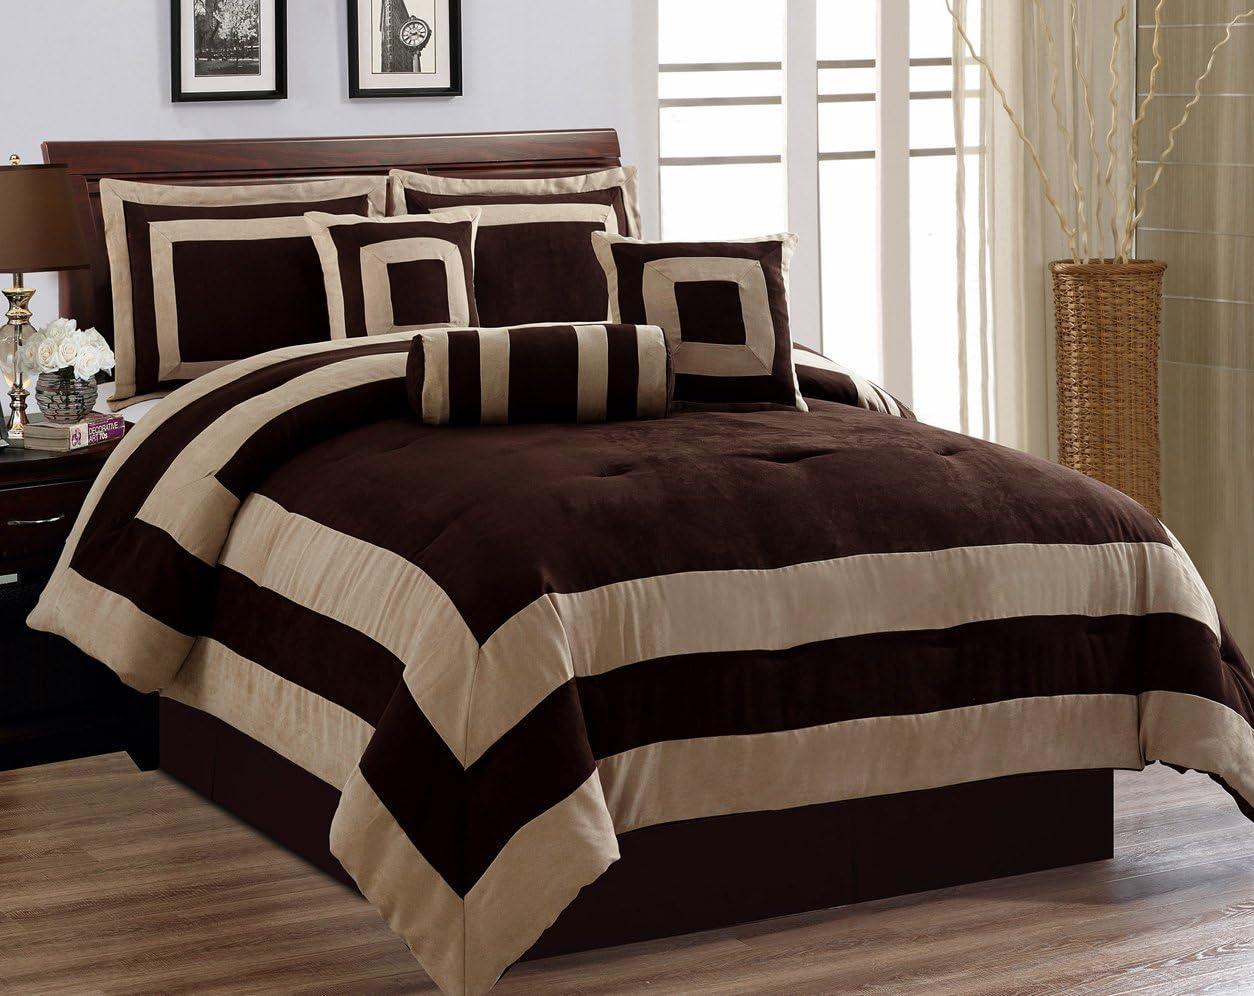 Amazon Com 7 Pieces Chocolate Brown Suede Comforter Set